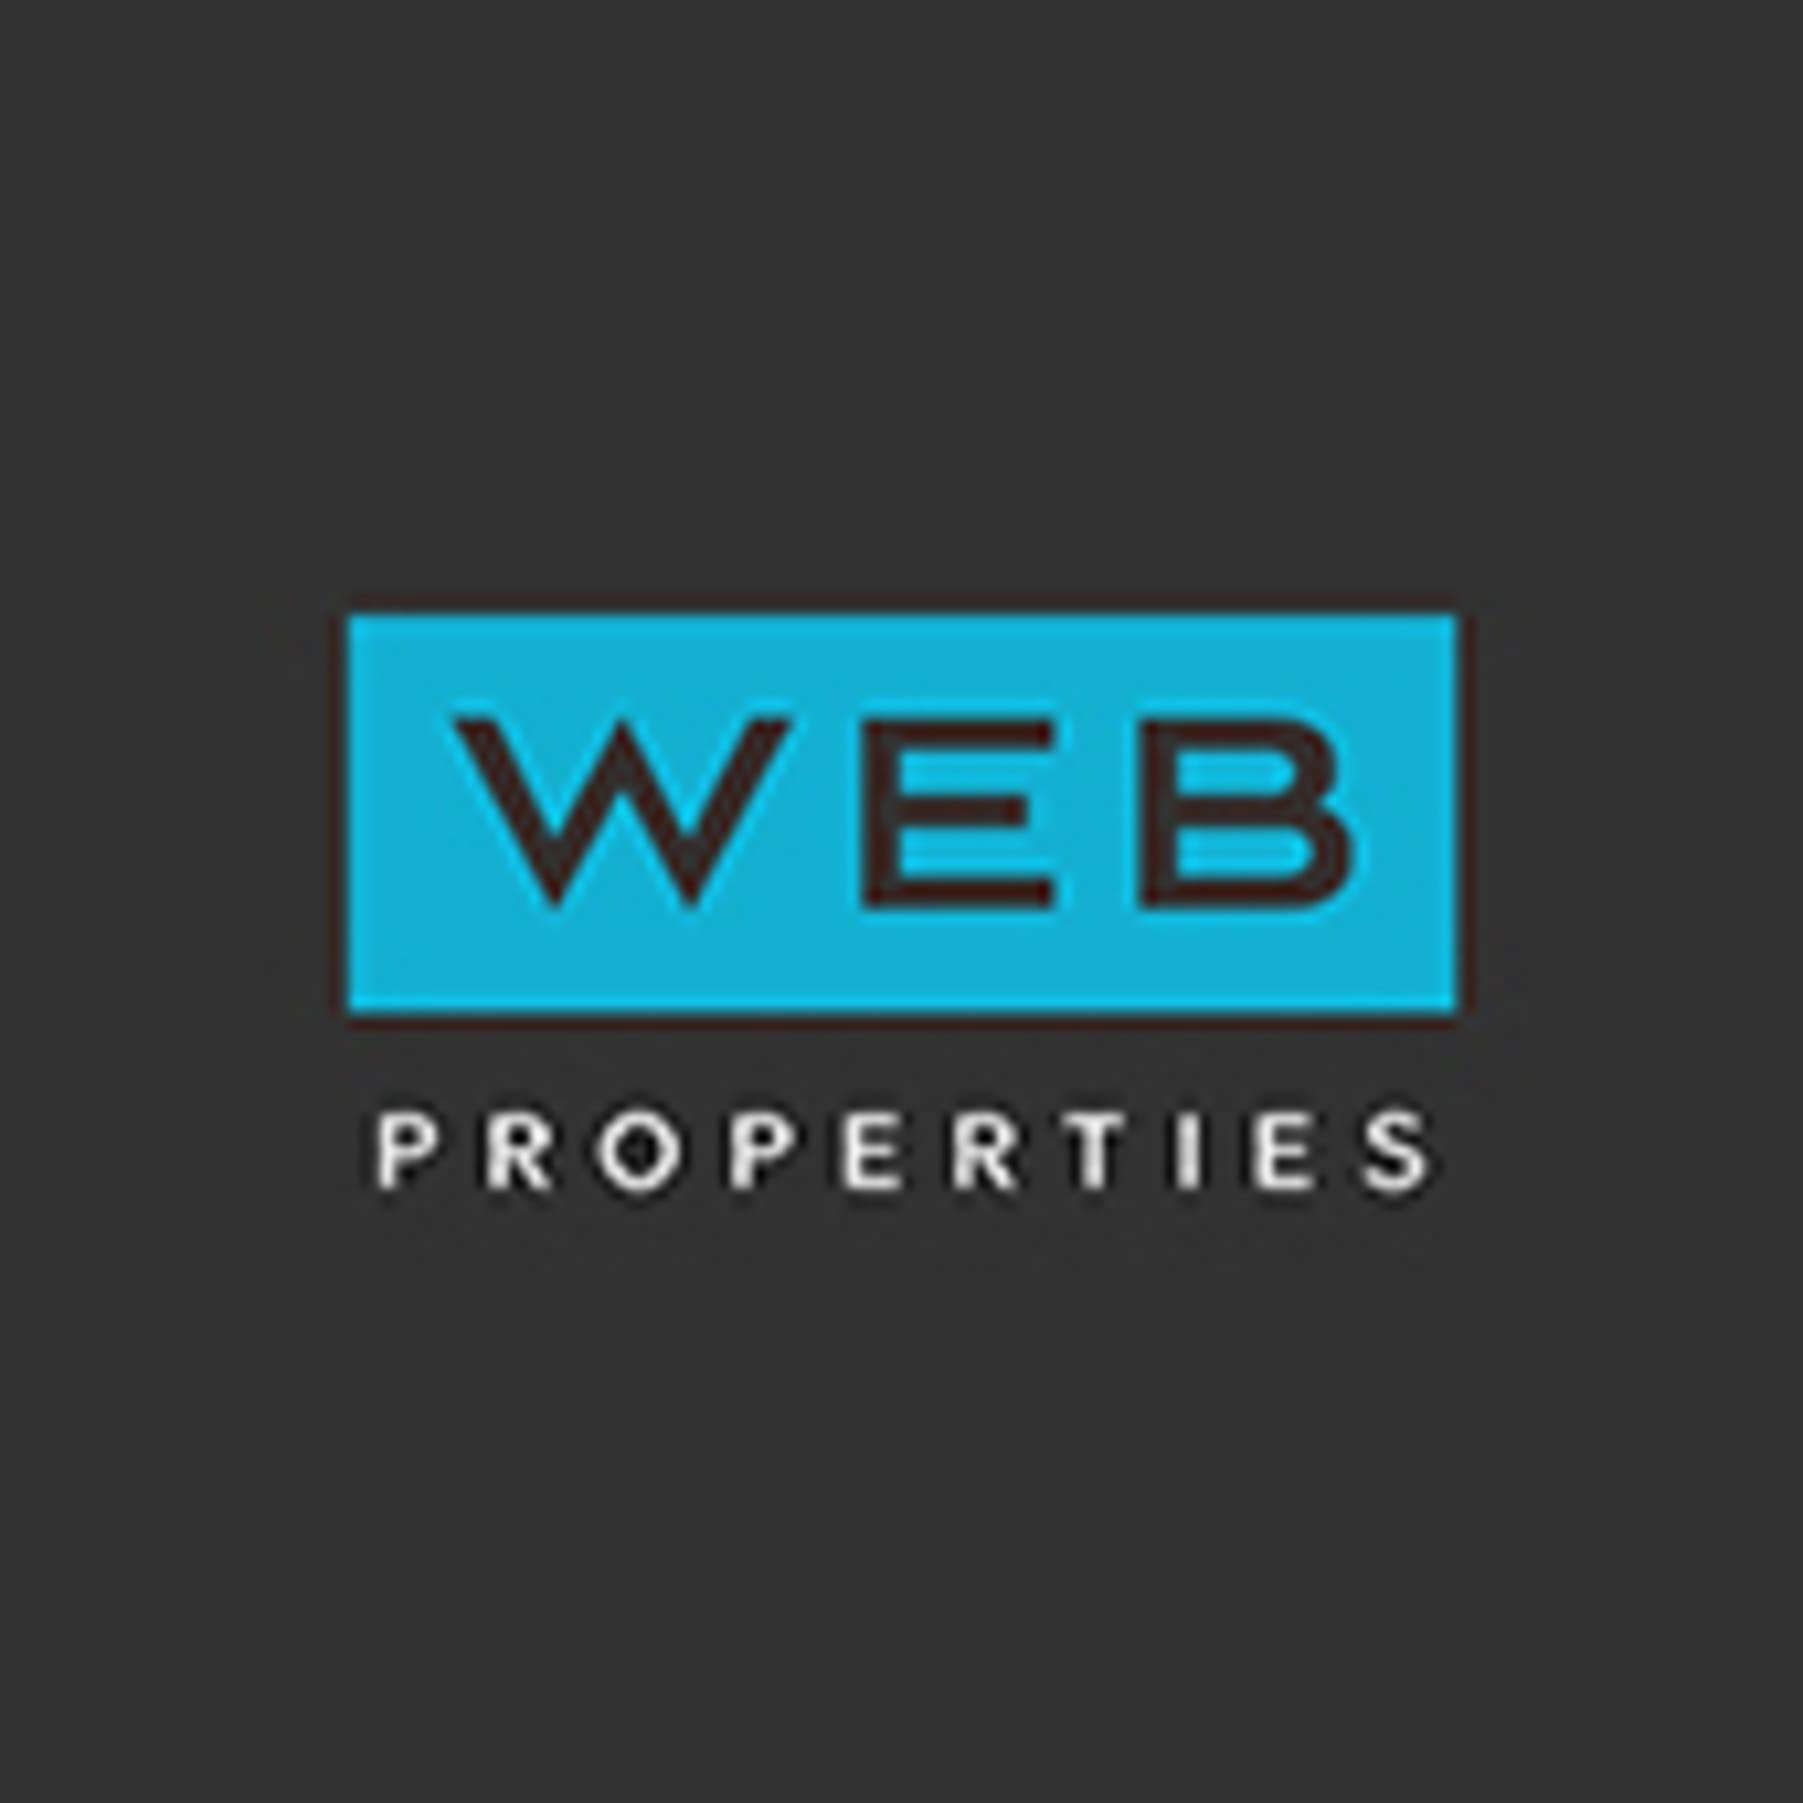 $750,000+ - WEB Properties